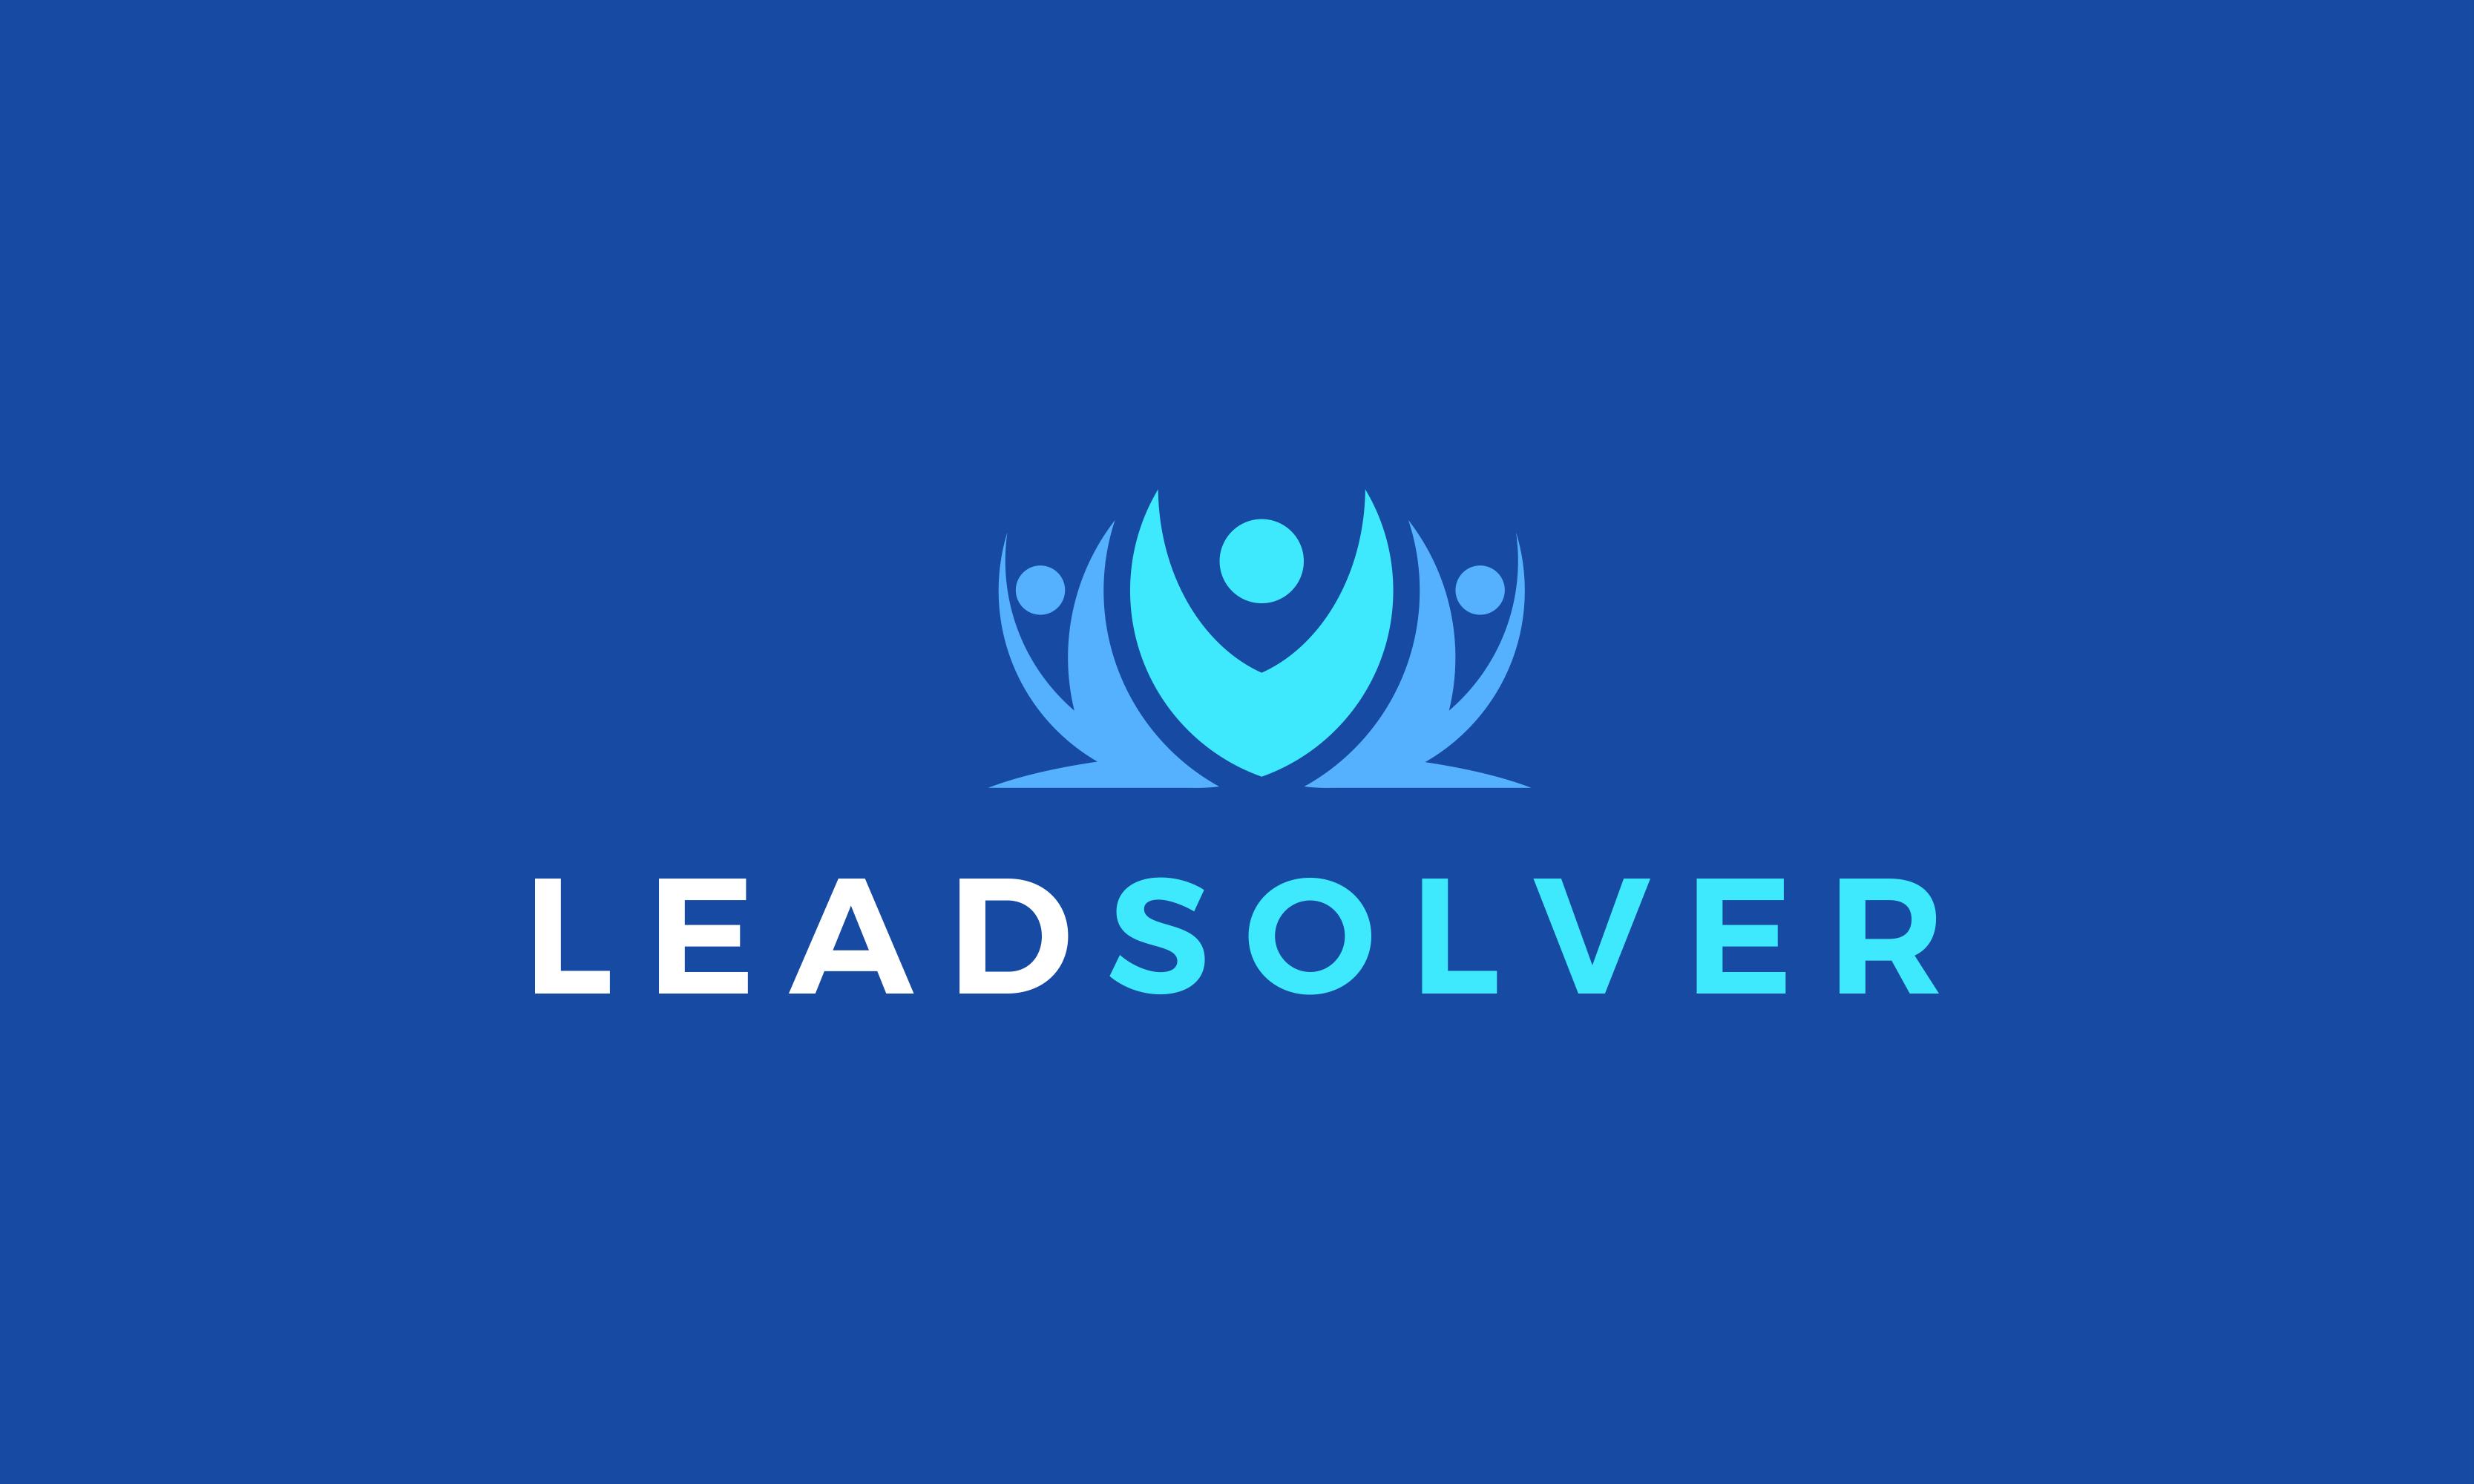 Leadsolver